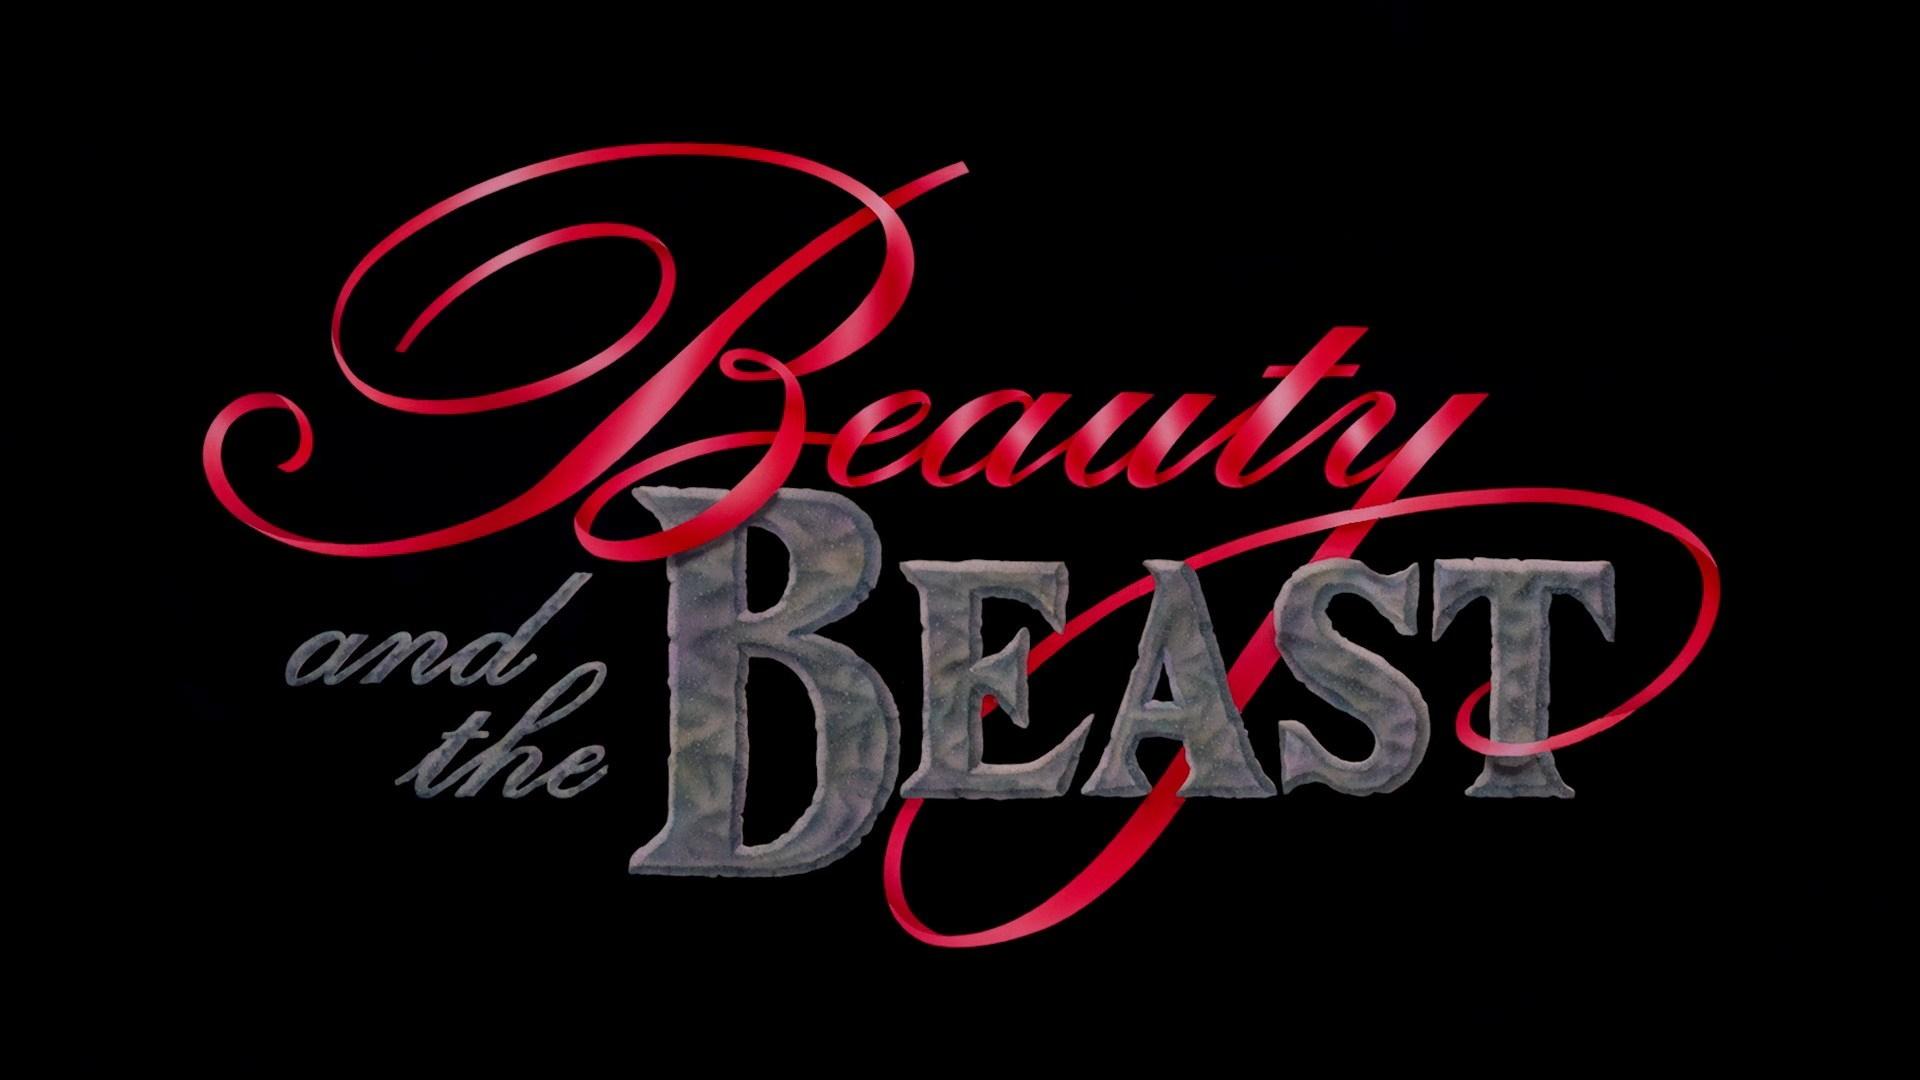 Skönheten och Odjuret (1991 Film) (@younglosbeats) Cover Image